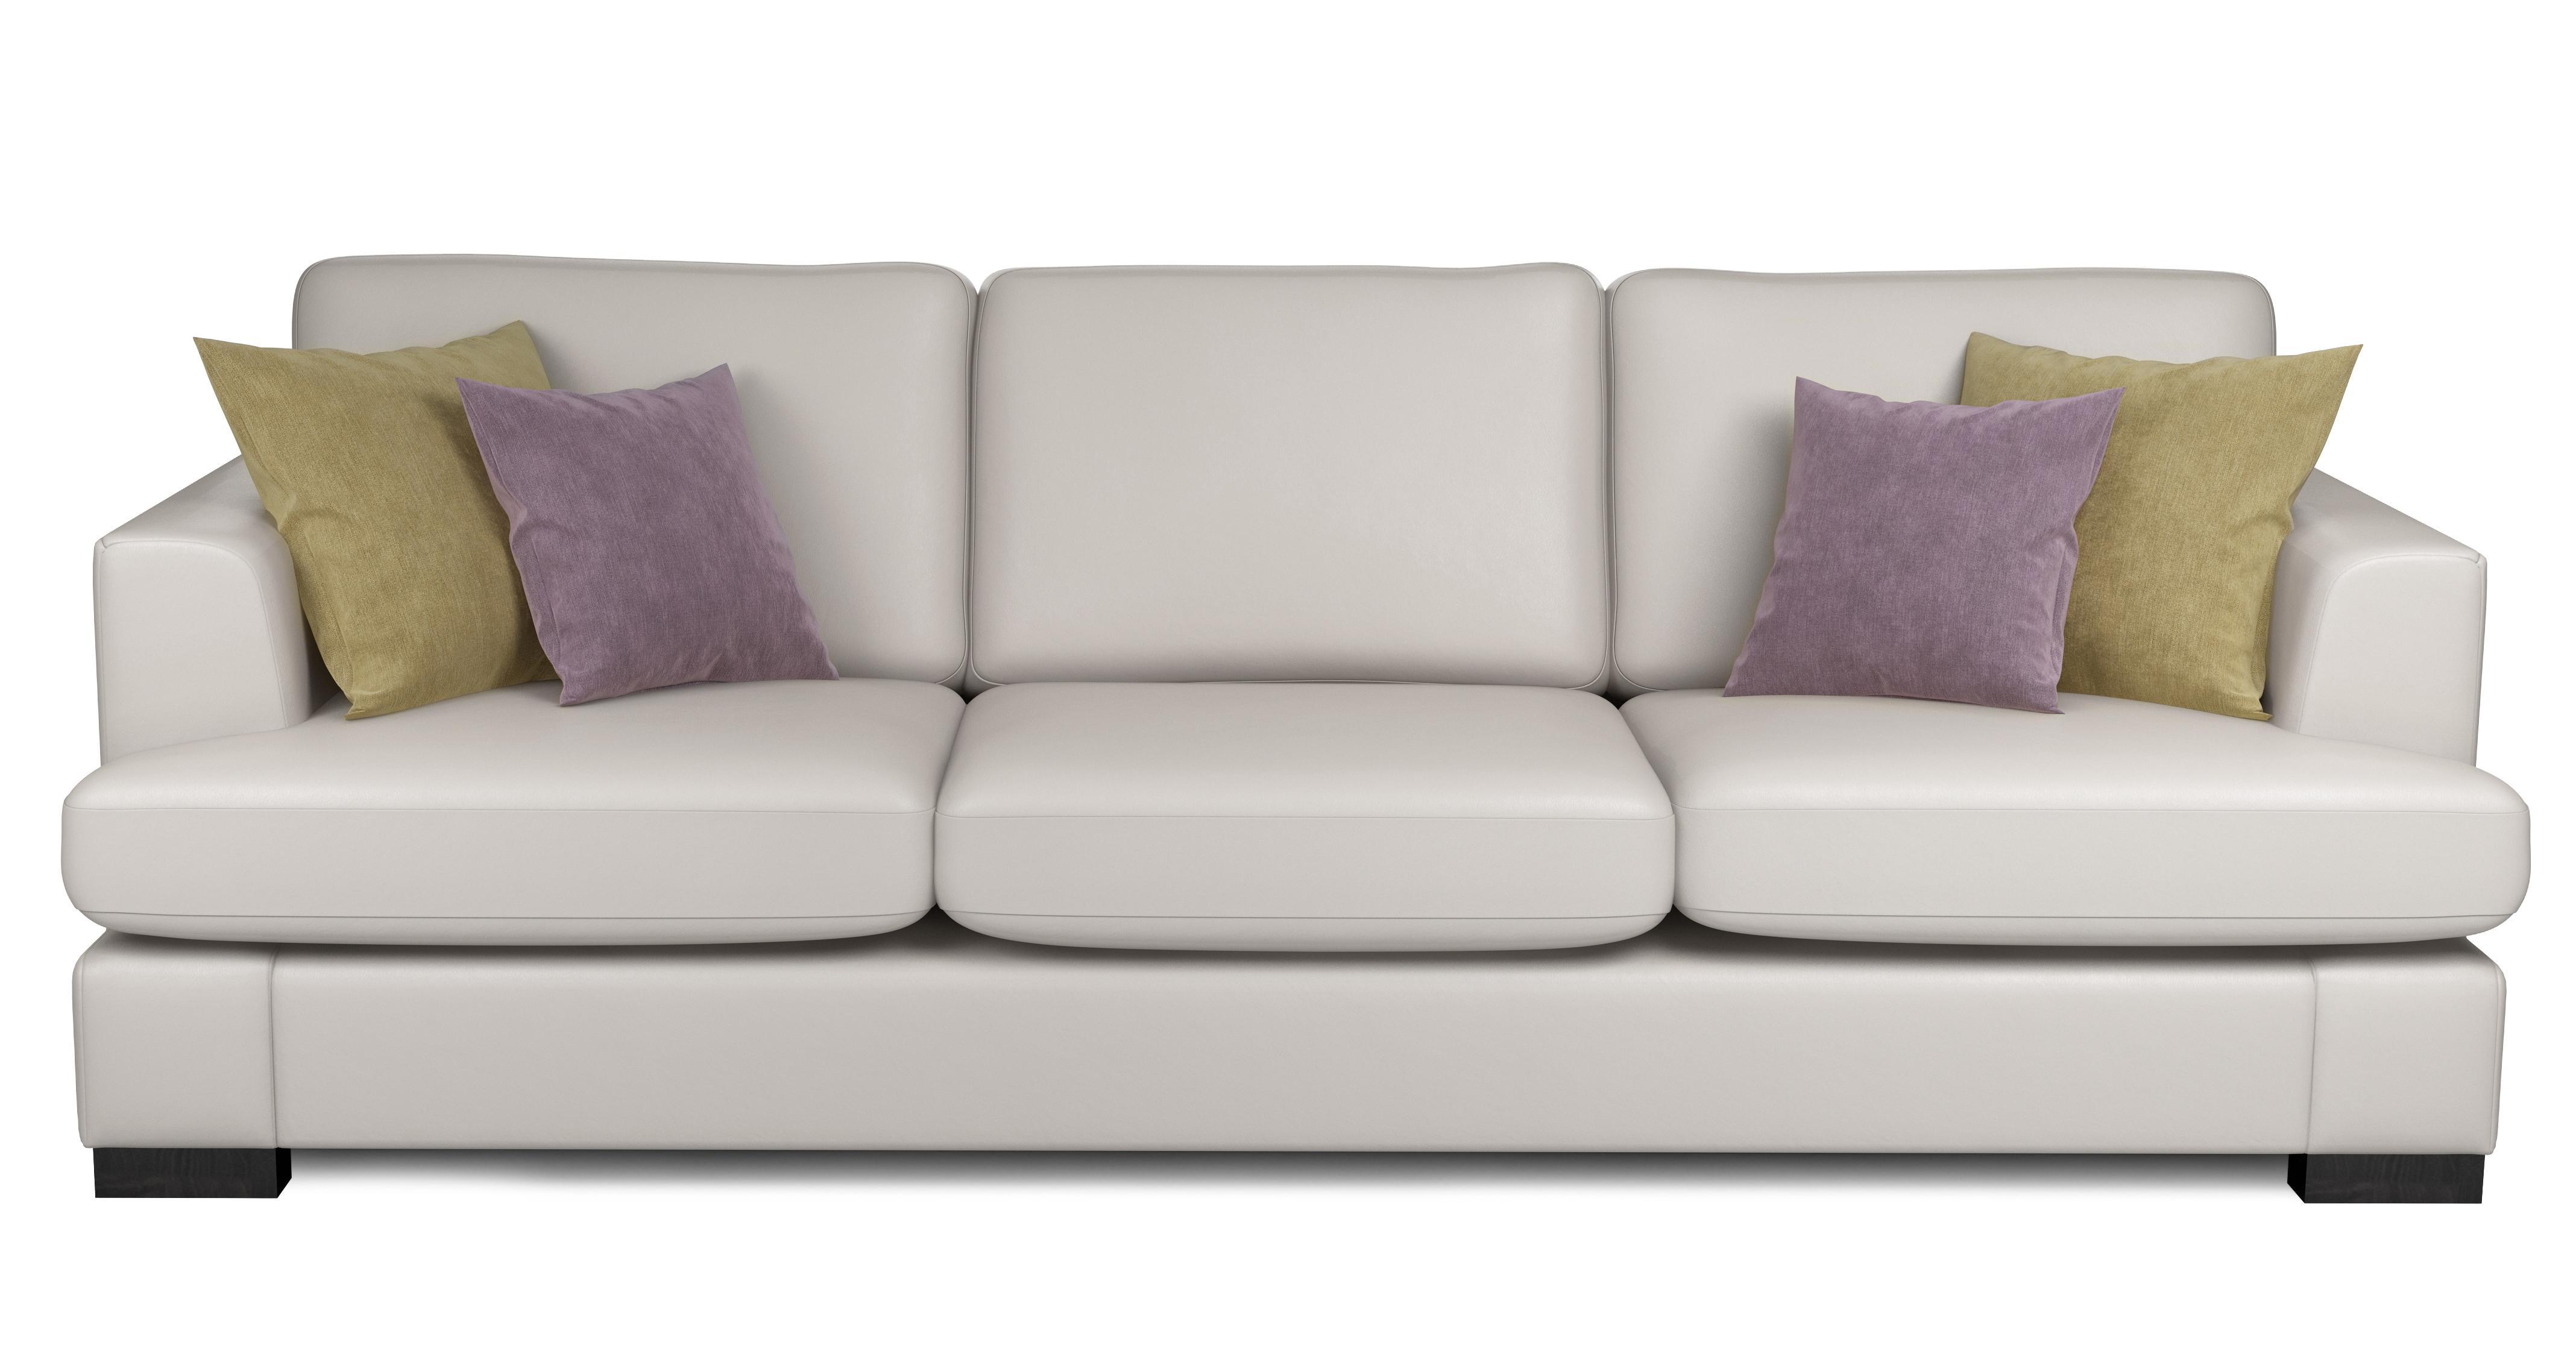 Peachy Freya Leather 4 Seater Sofa Machost Co Dining Chair Design Ideas Machostcouk